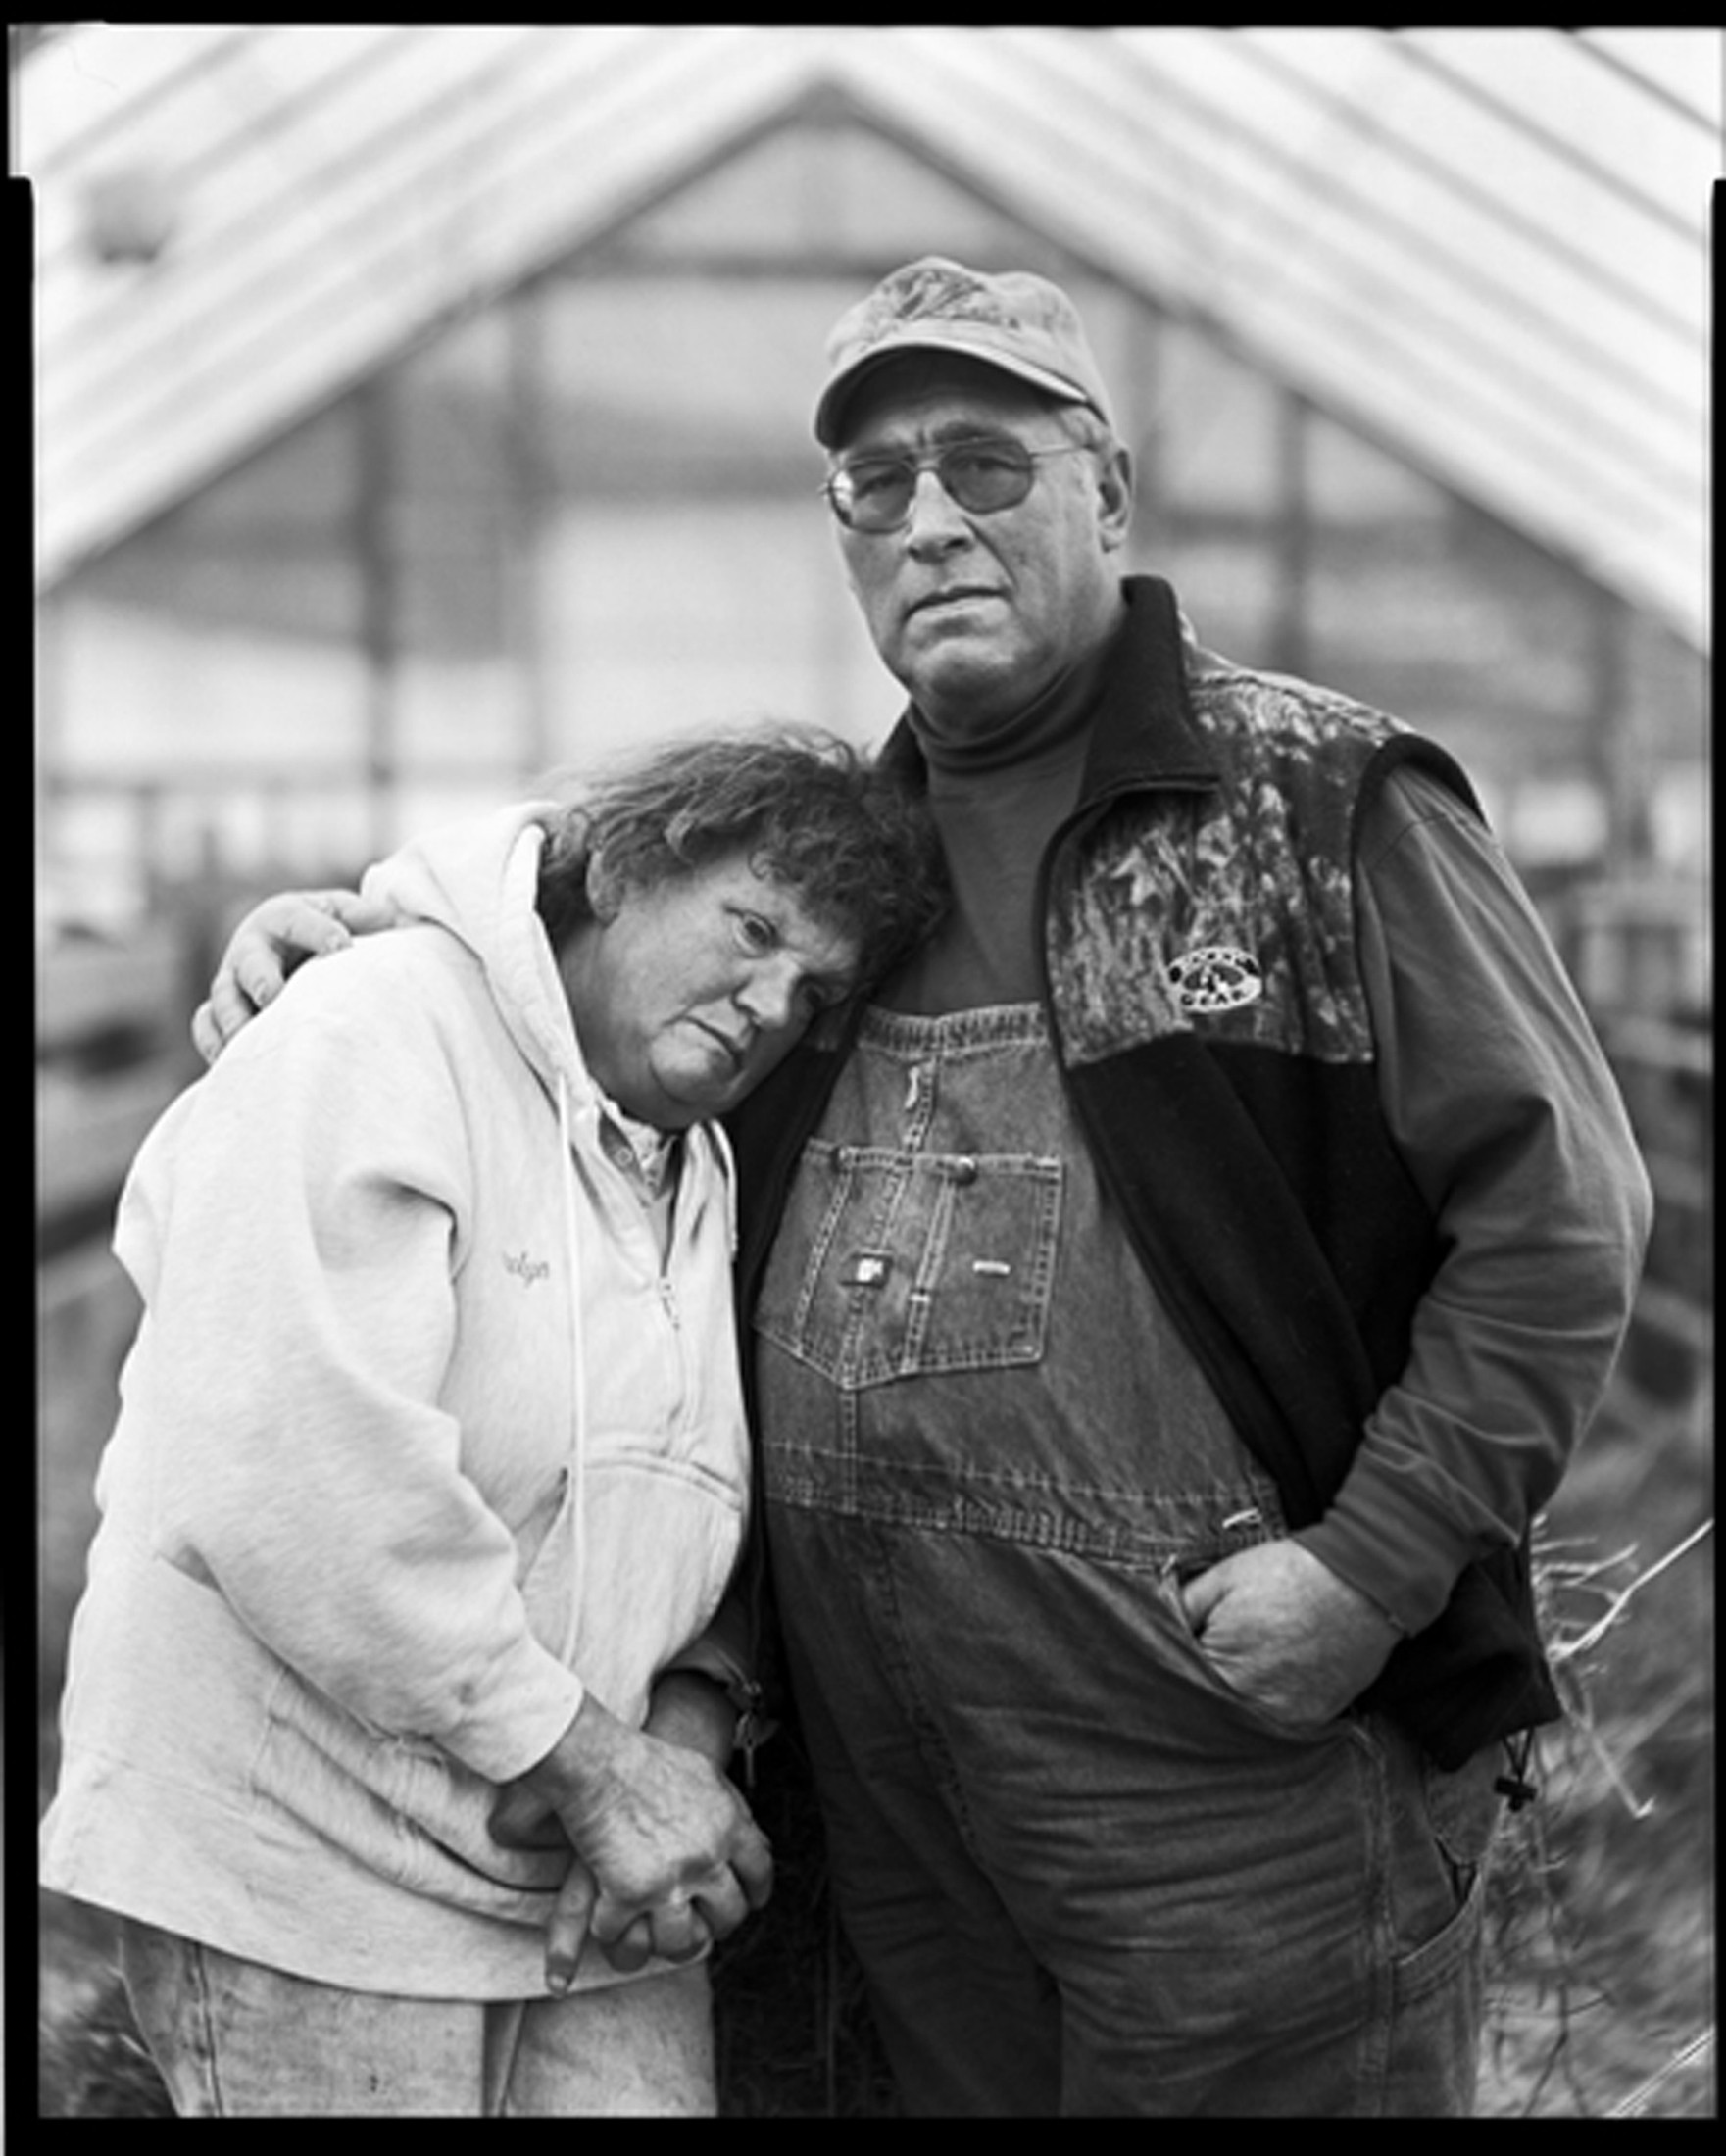 David and Carolyn Post Dairy Farmers. Delaware County, NY, 2005